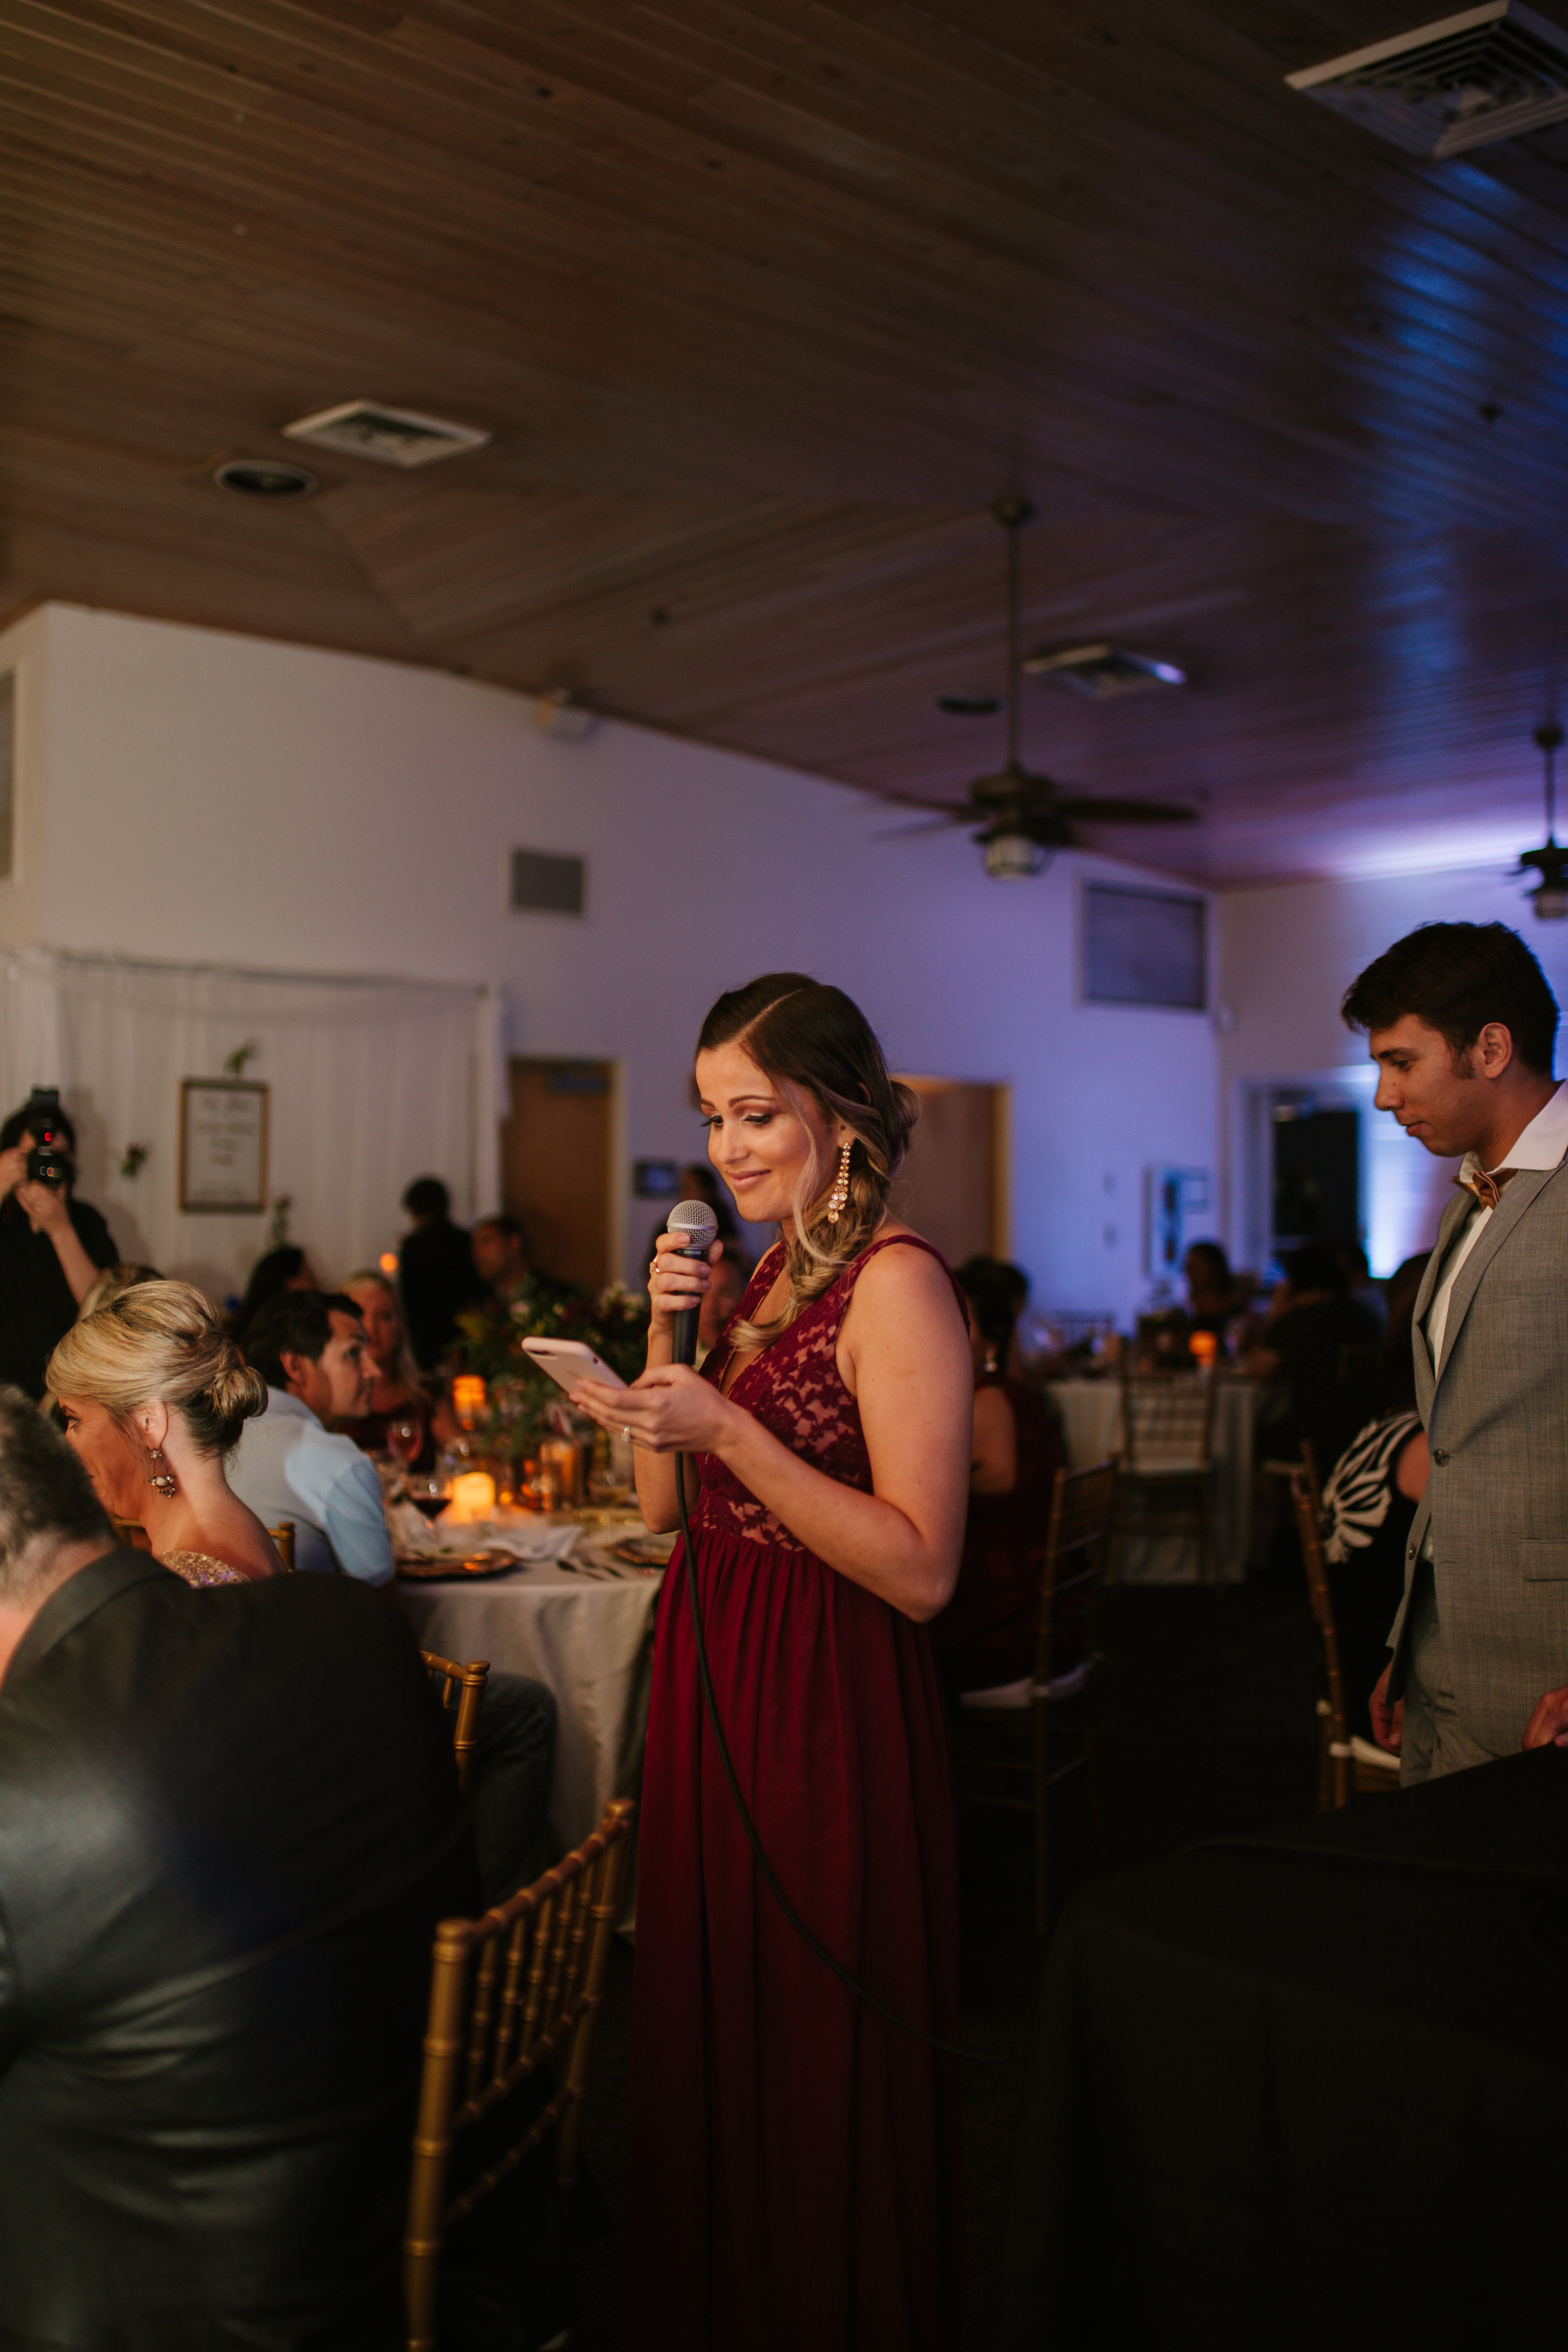 2017.05.23 Barbara and Mauricio Sales Port St Lucie Wedding (661 of 772).jpg